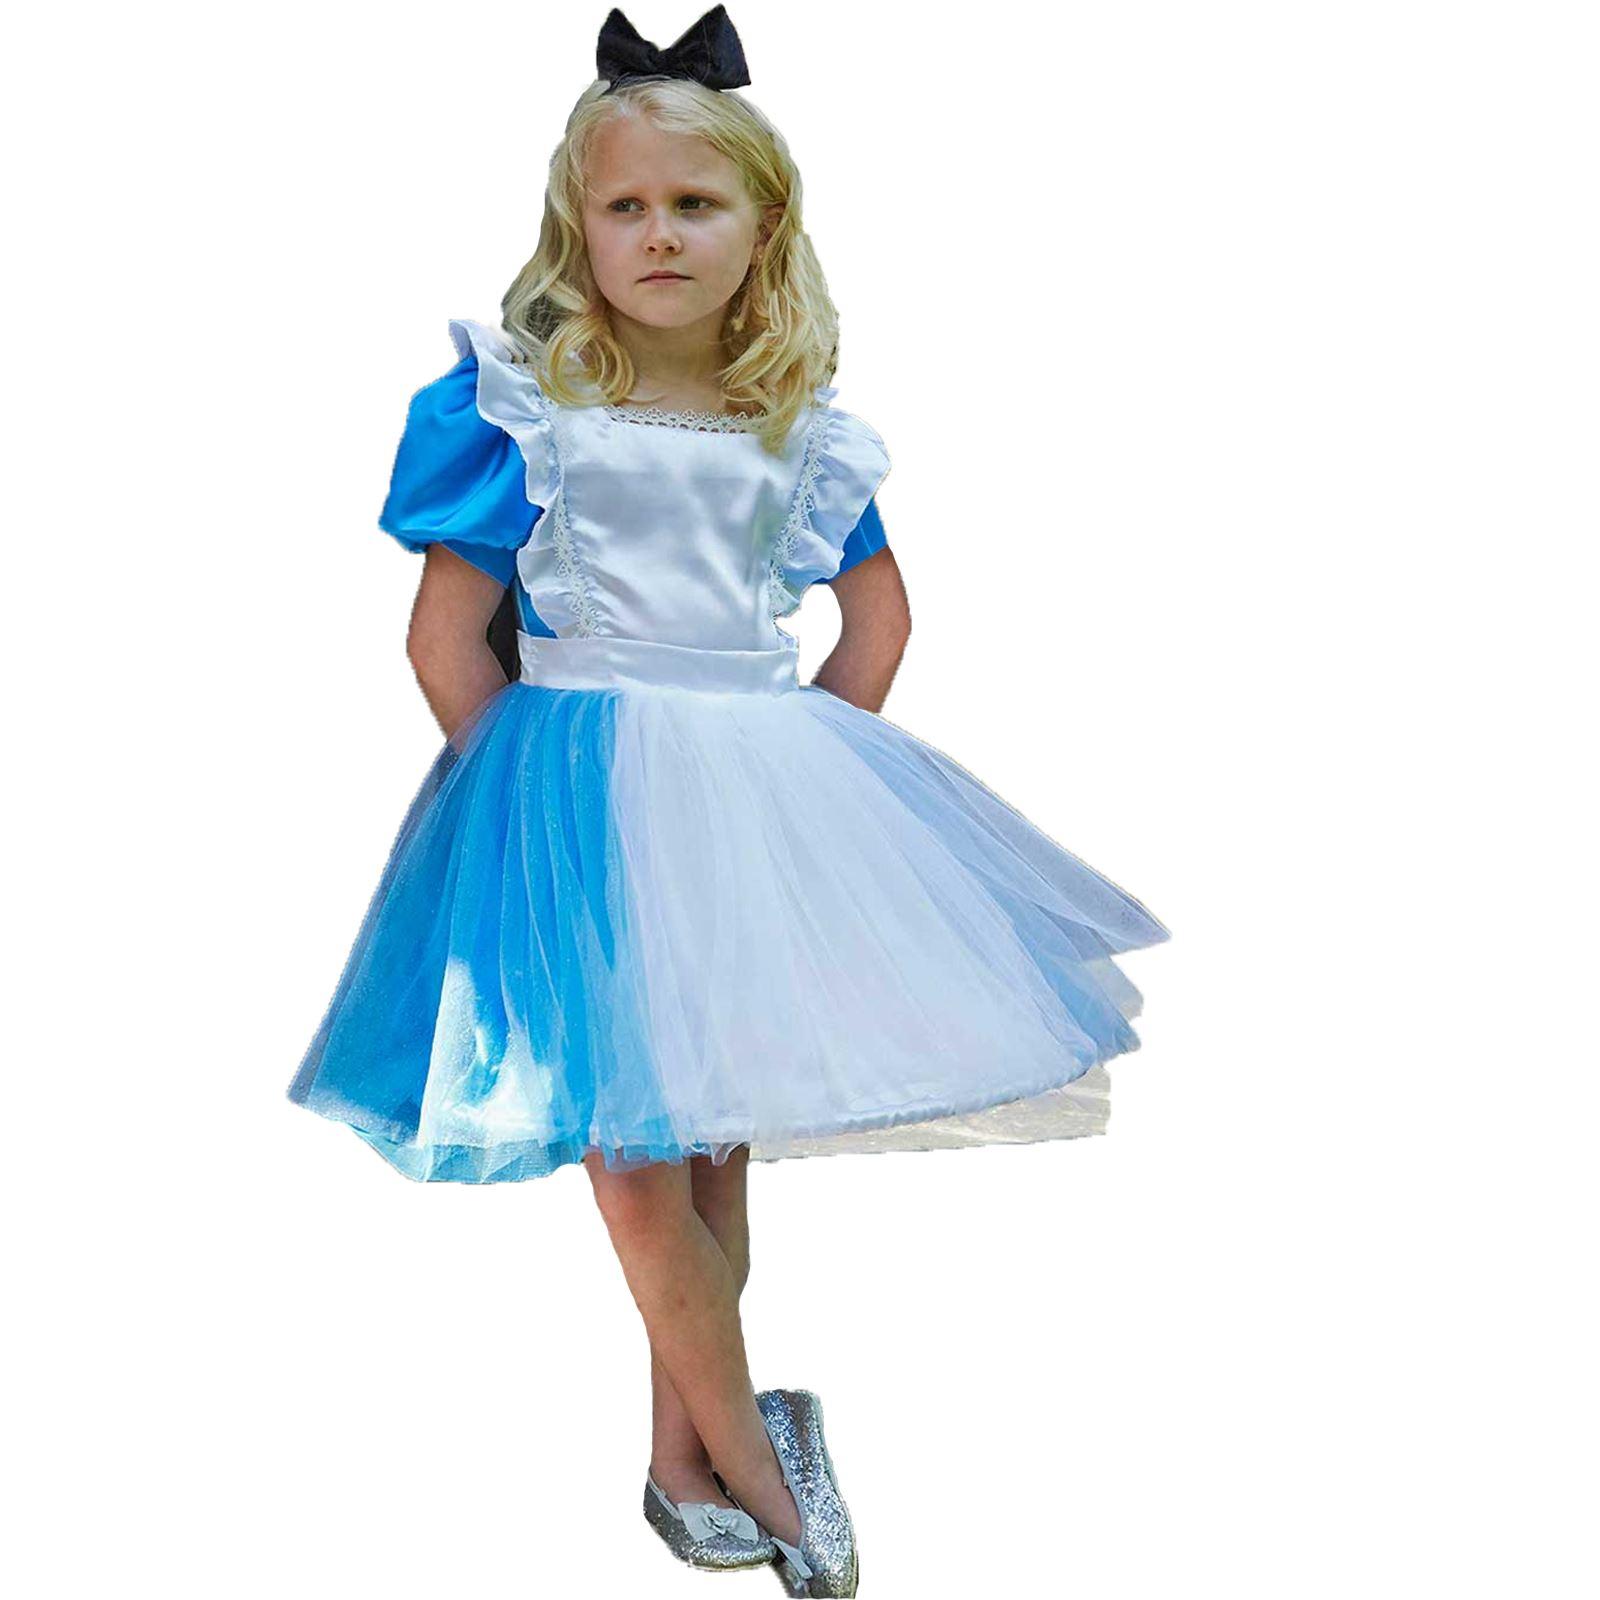 Classic Storybook Alice In Wonderland Fairytale Girls Childs Fancy Dress Costume